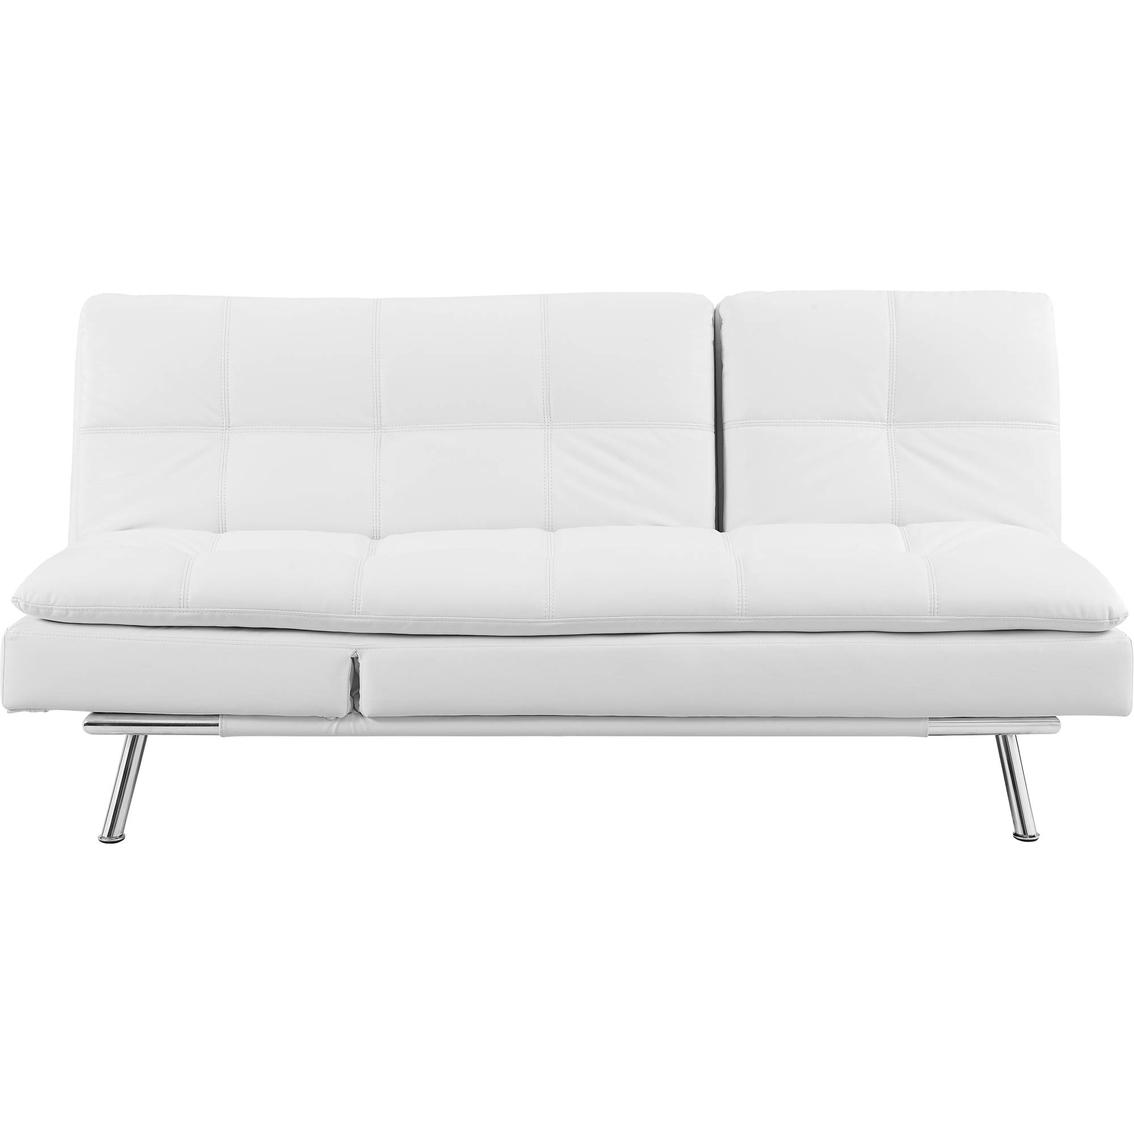 Serta Palermo Convertible White Leather Sleeper Chaise